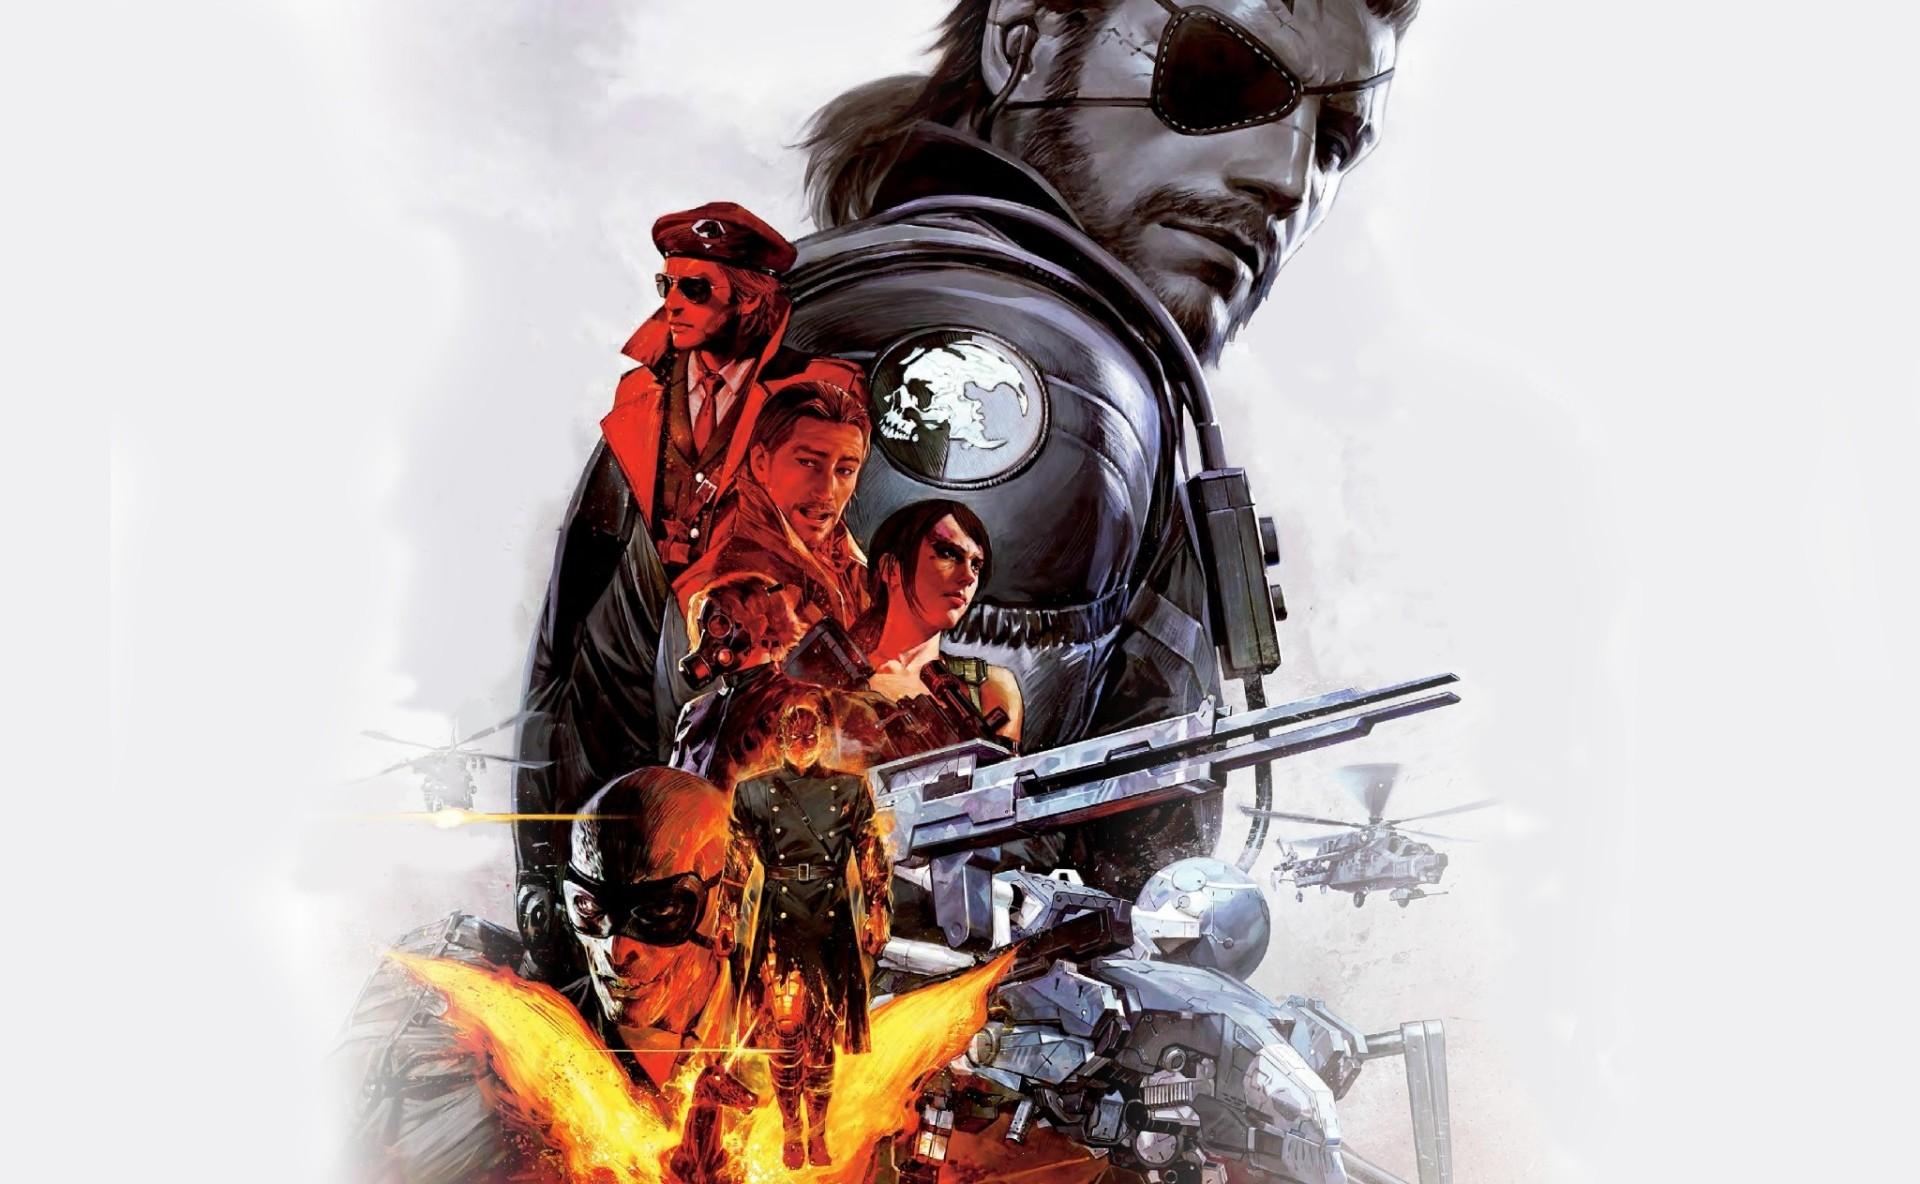 Vídeo Game Metal Gear Solid V: The Phantom Pain Solid Snake Papel de Parede